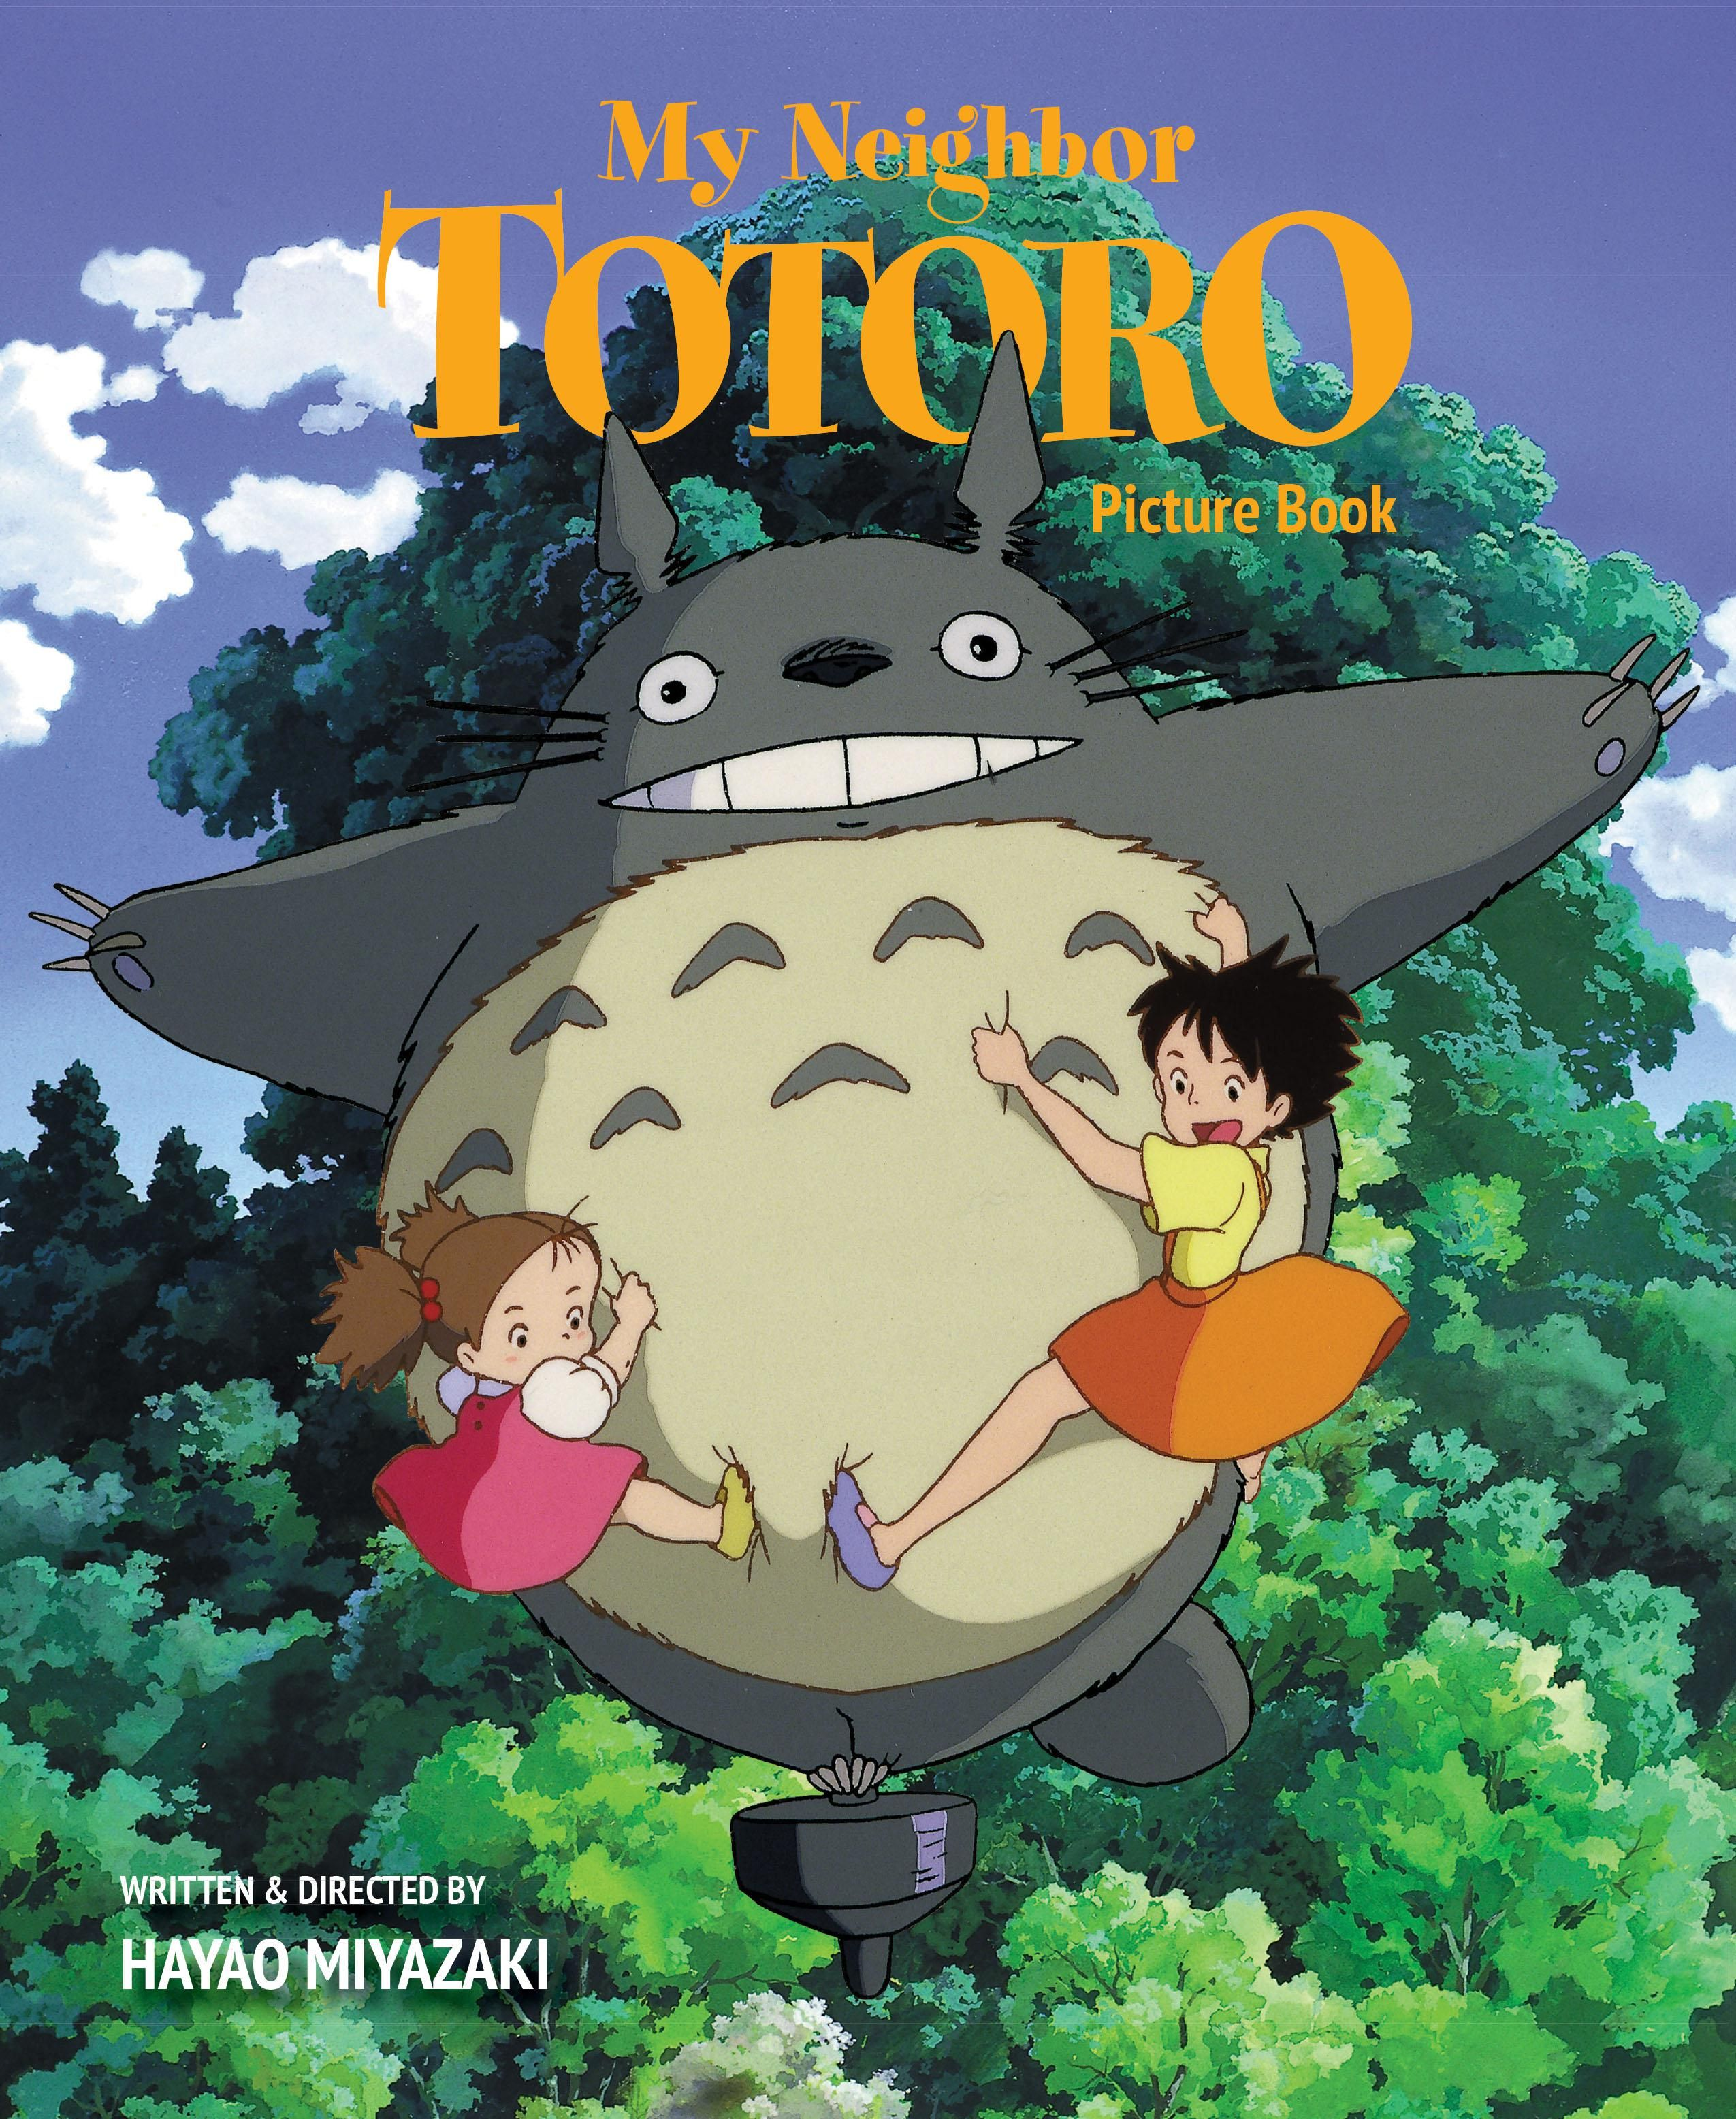 My Neighbour Totoro 1988 Poster Totoro Imagenes Peliculas De Anime Totoro